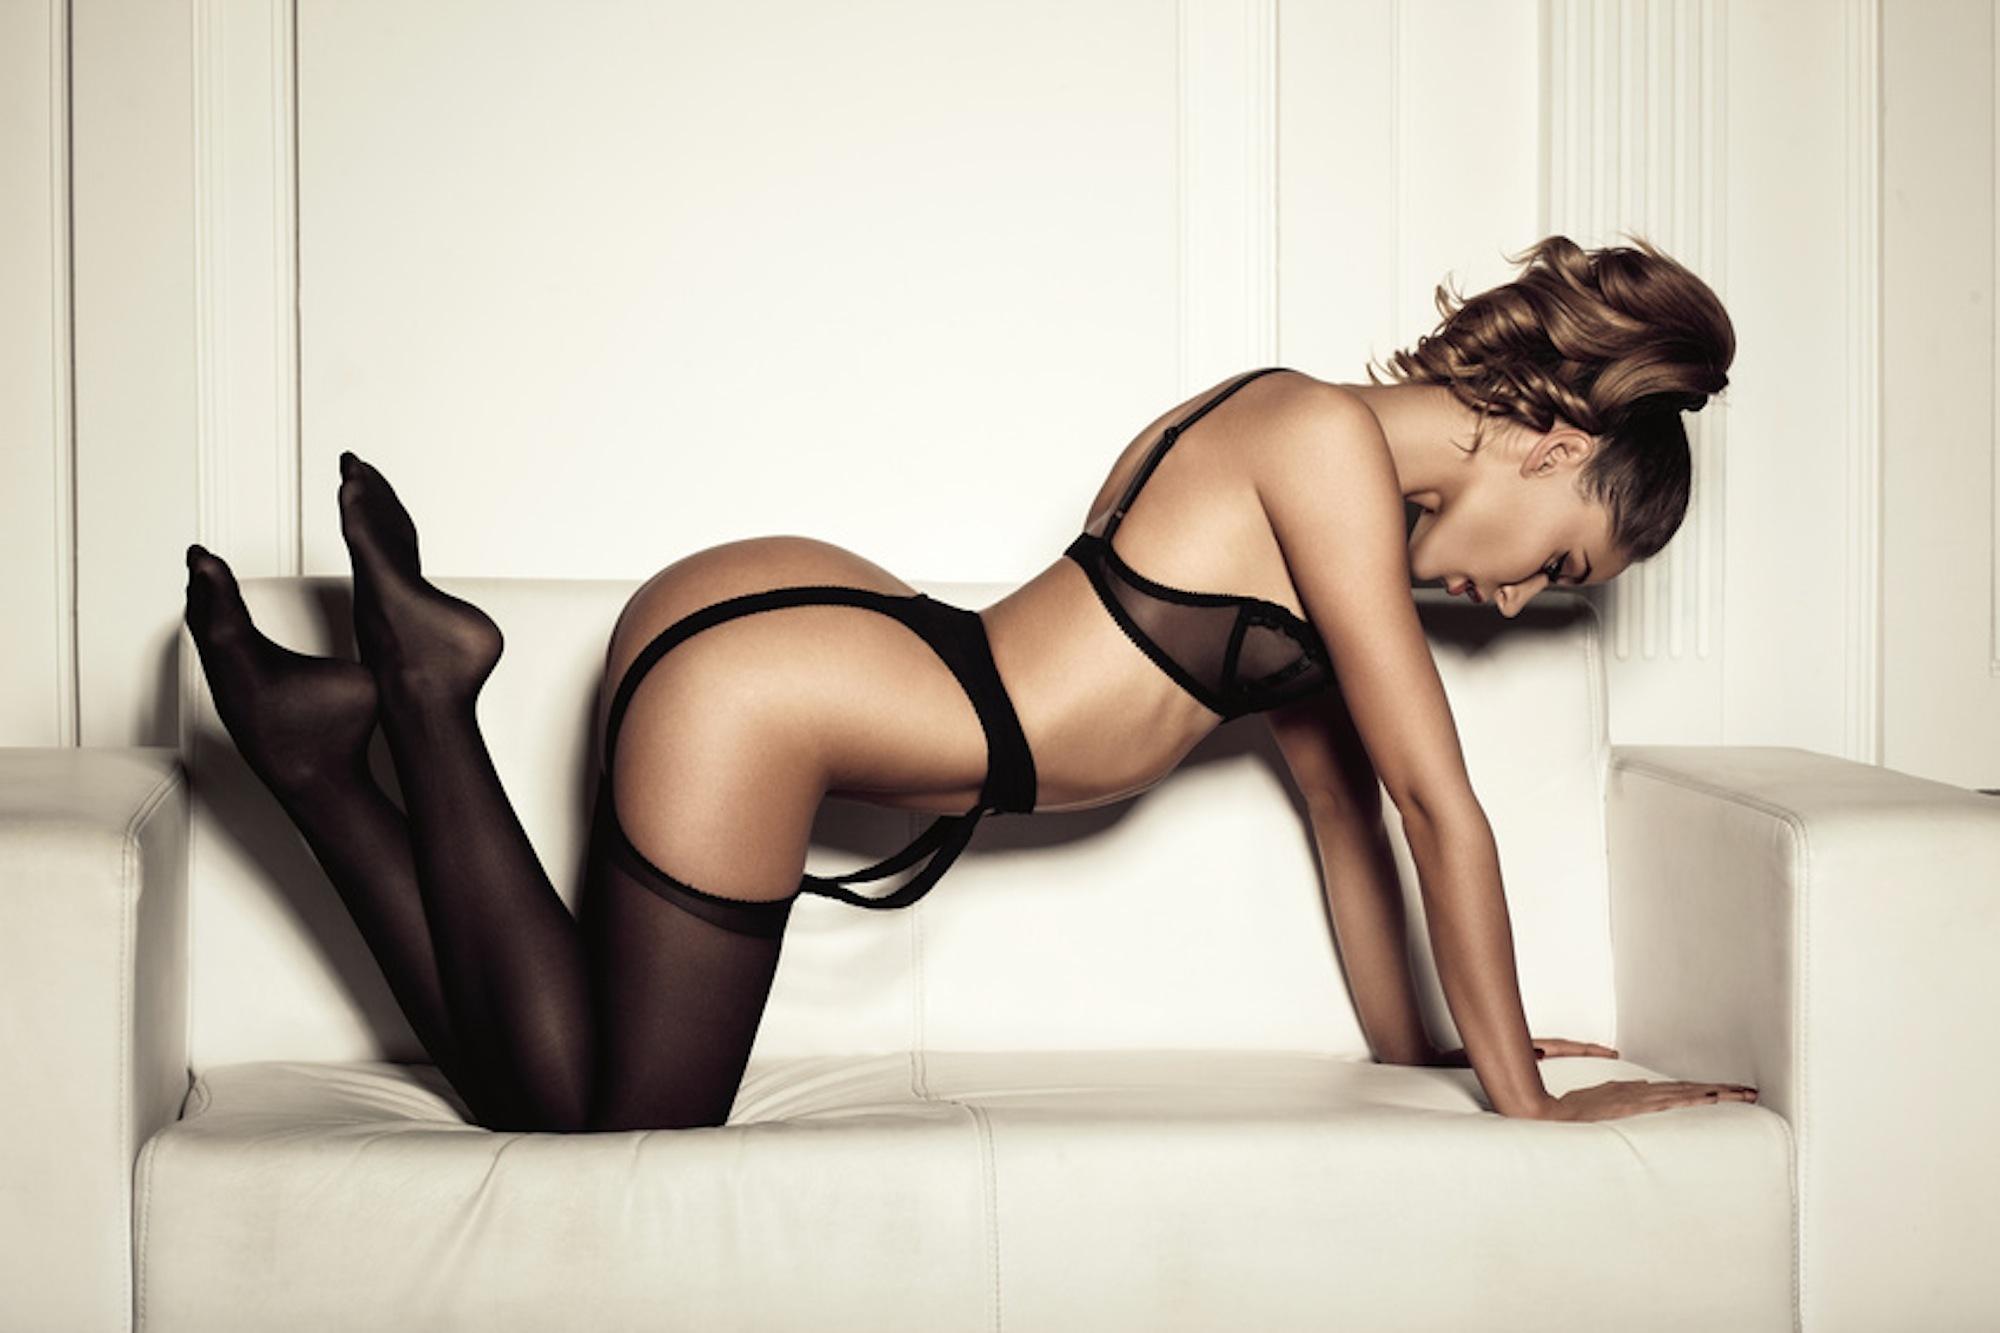 Victoria rae black stockings